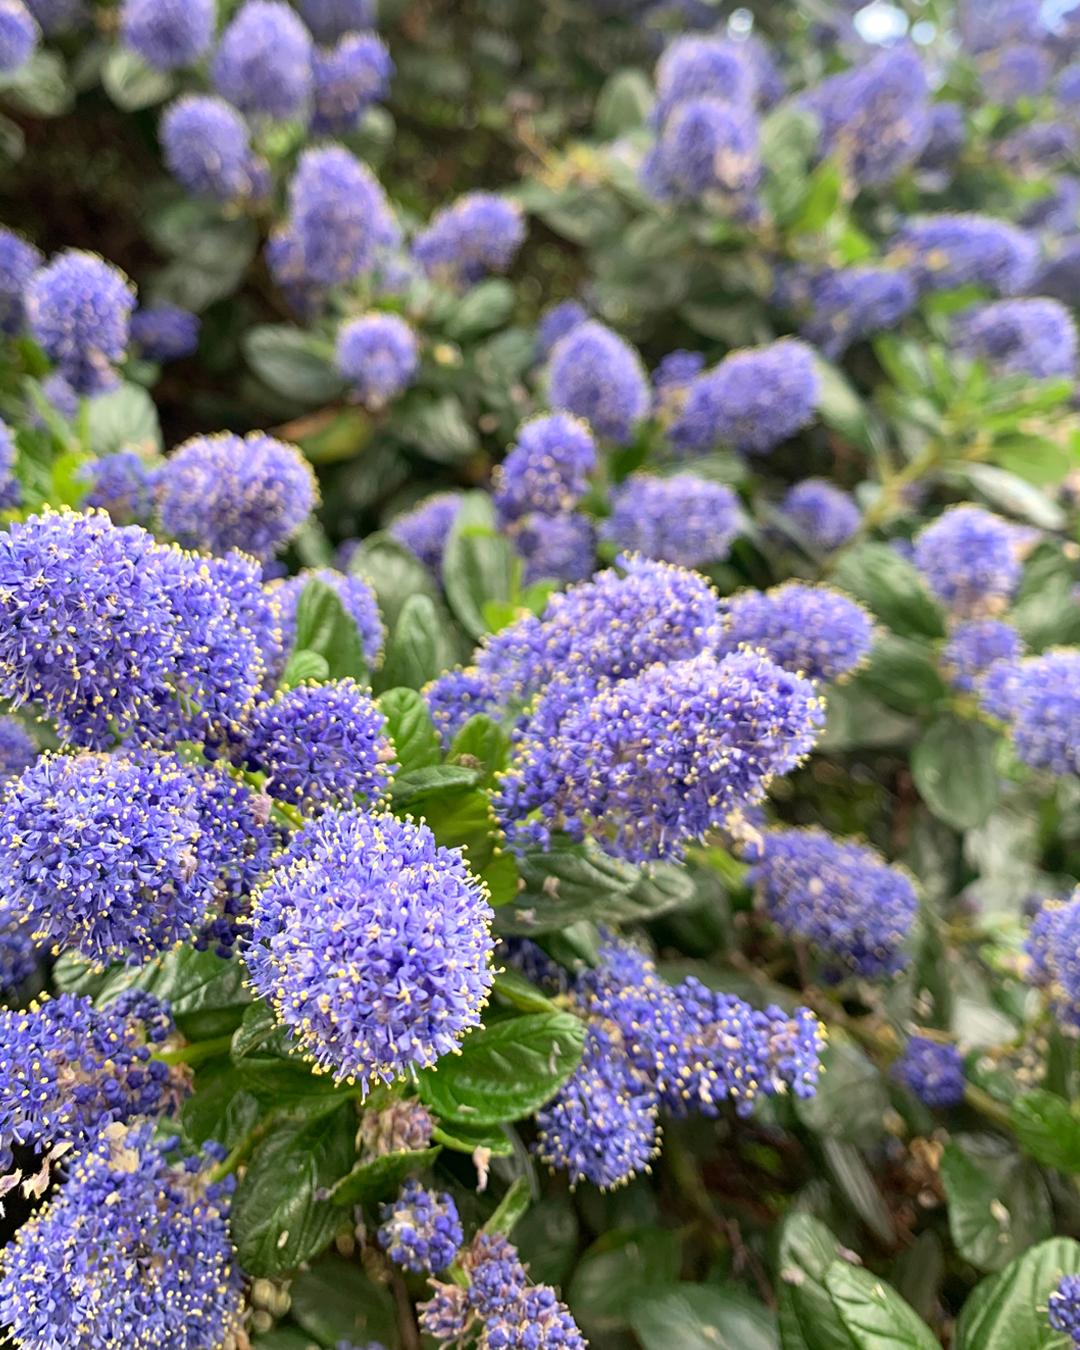 Ceanothus purple flowering bush in London - UK lifestyle blog